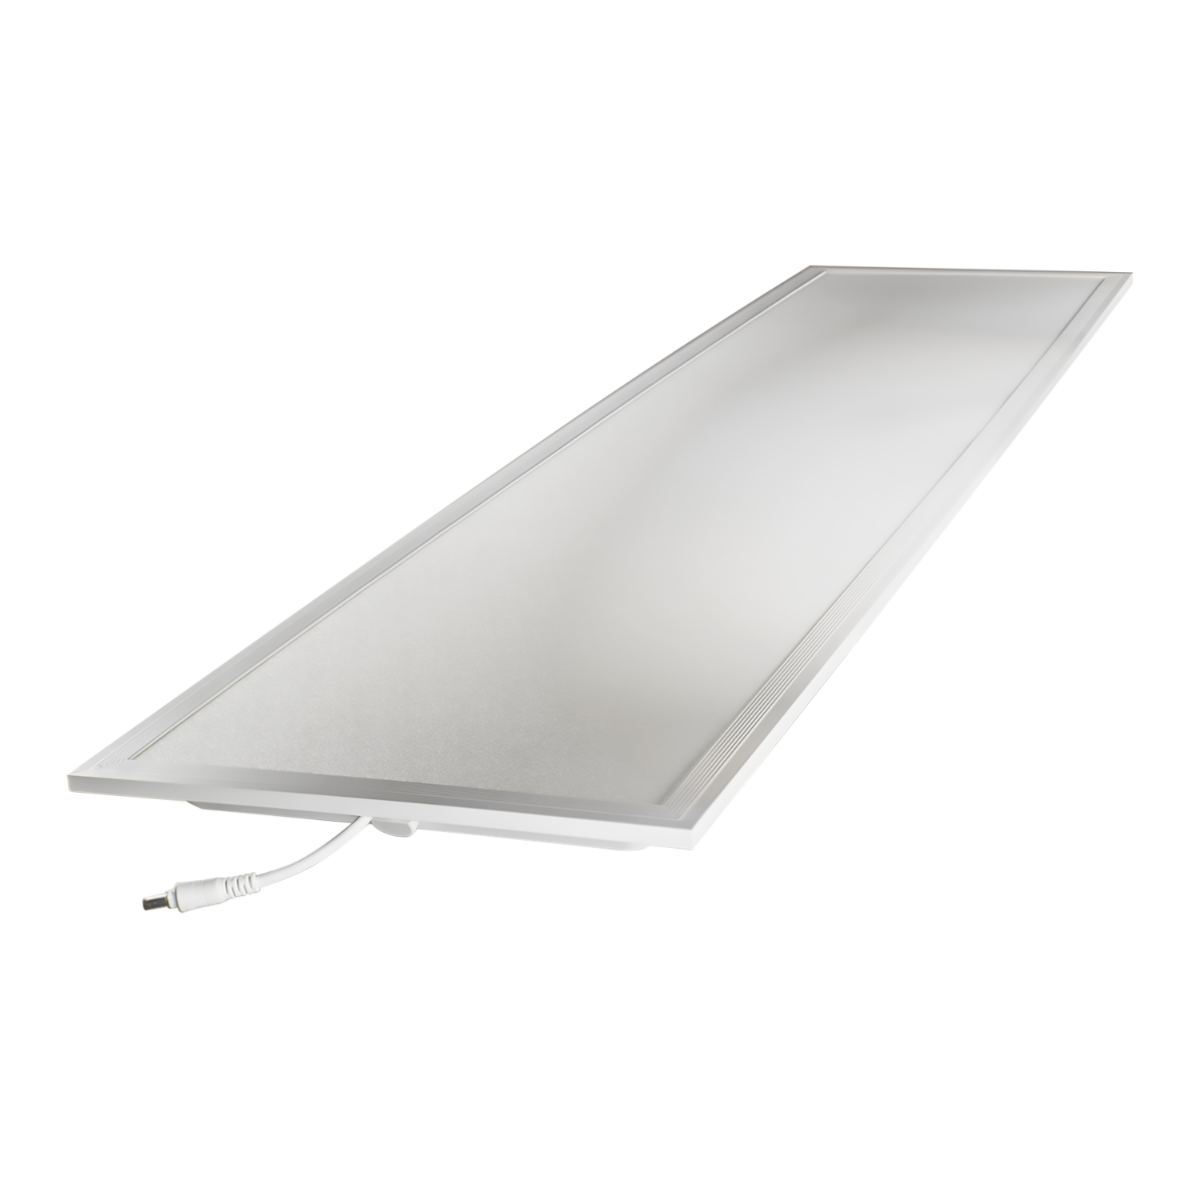 Noxion LED Paneeli Delta Pro V2.0 30W 30x120cm 6500K 4110lm UGR <19 | Päivänvalo Valkoinen - Korvaa 2x36W